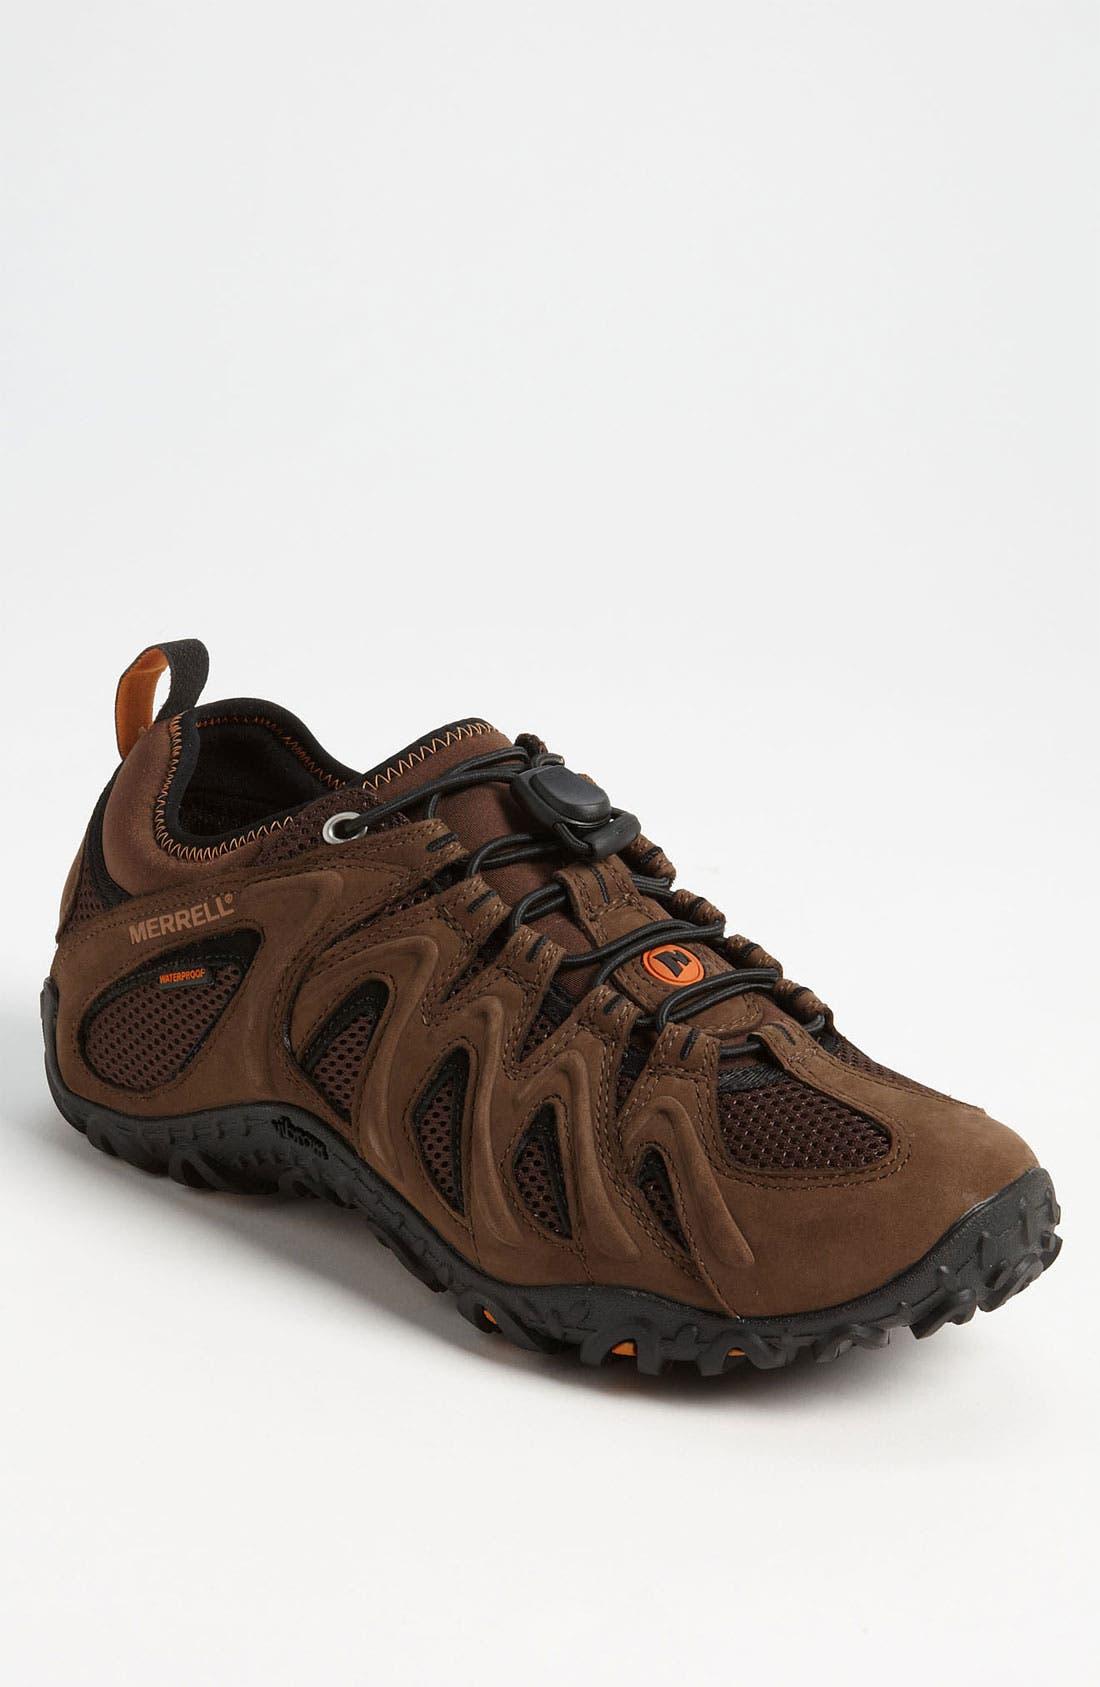 Alternate Image 1 Selected - Merrell 'Chameleon 4 Stretch' Waterproof Hiking Shoe (Men)